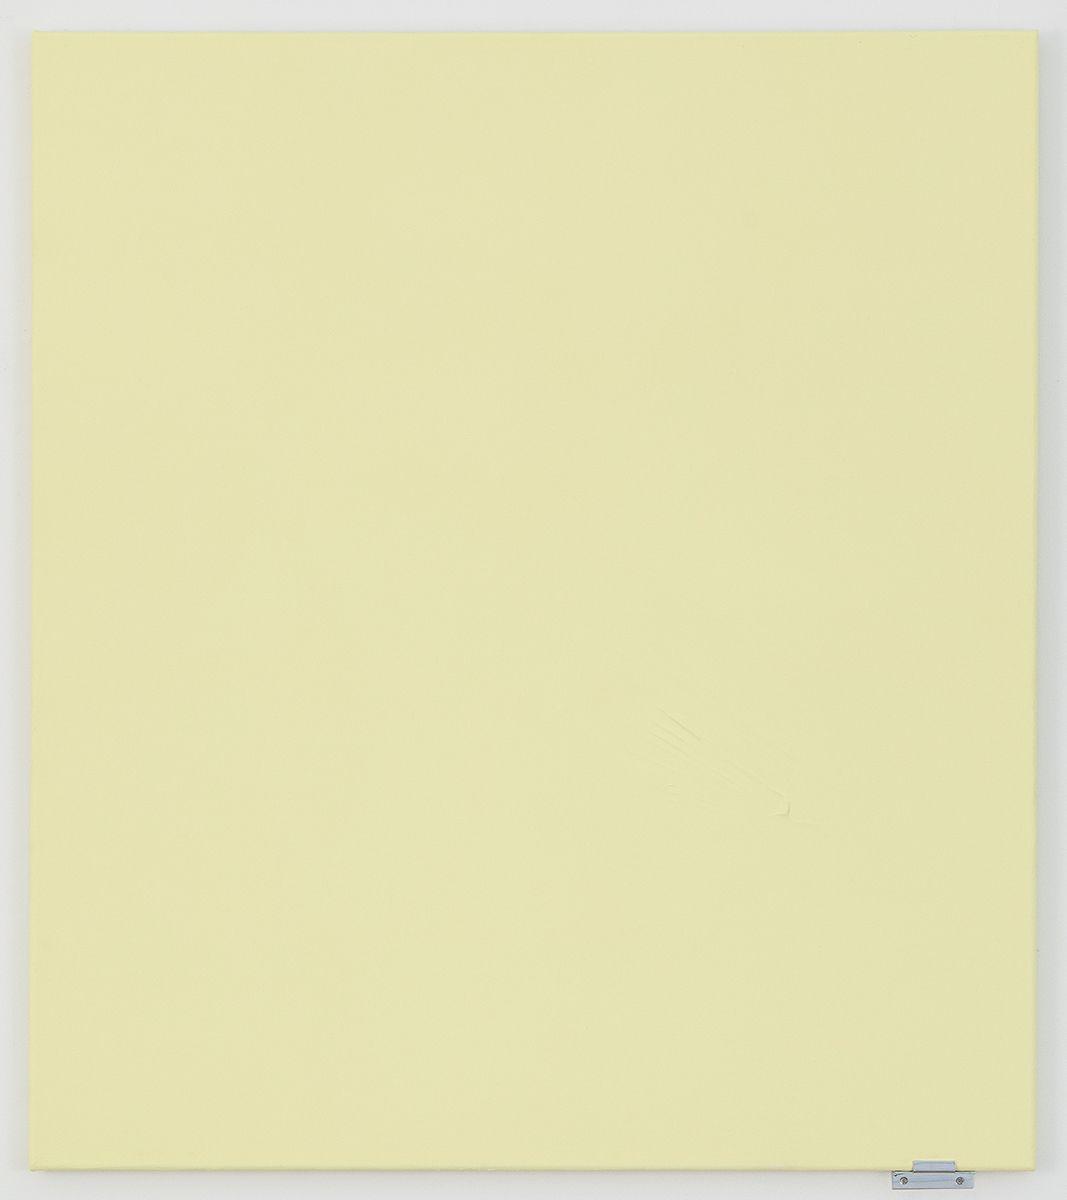 Monika Baer Untitled, 2018 Acrylic and quartz on canvas, aluminum  19 2/3 x 15 3/4 inches (50 x 40 cm)